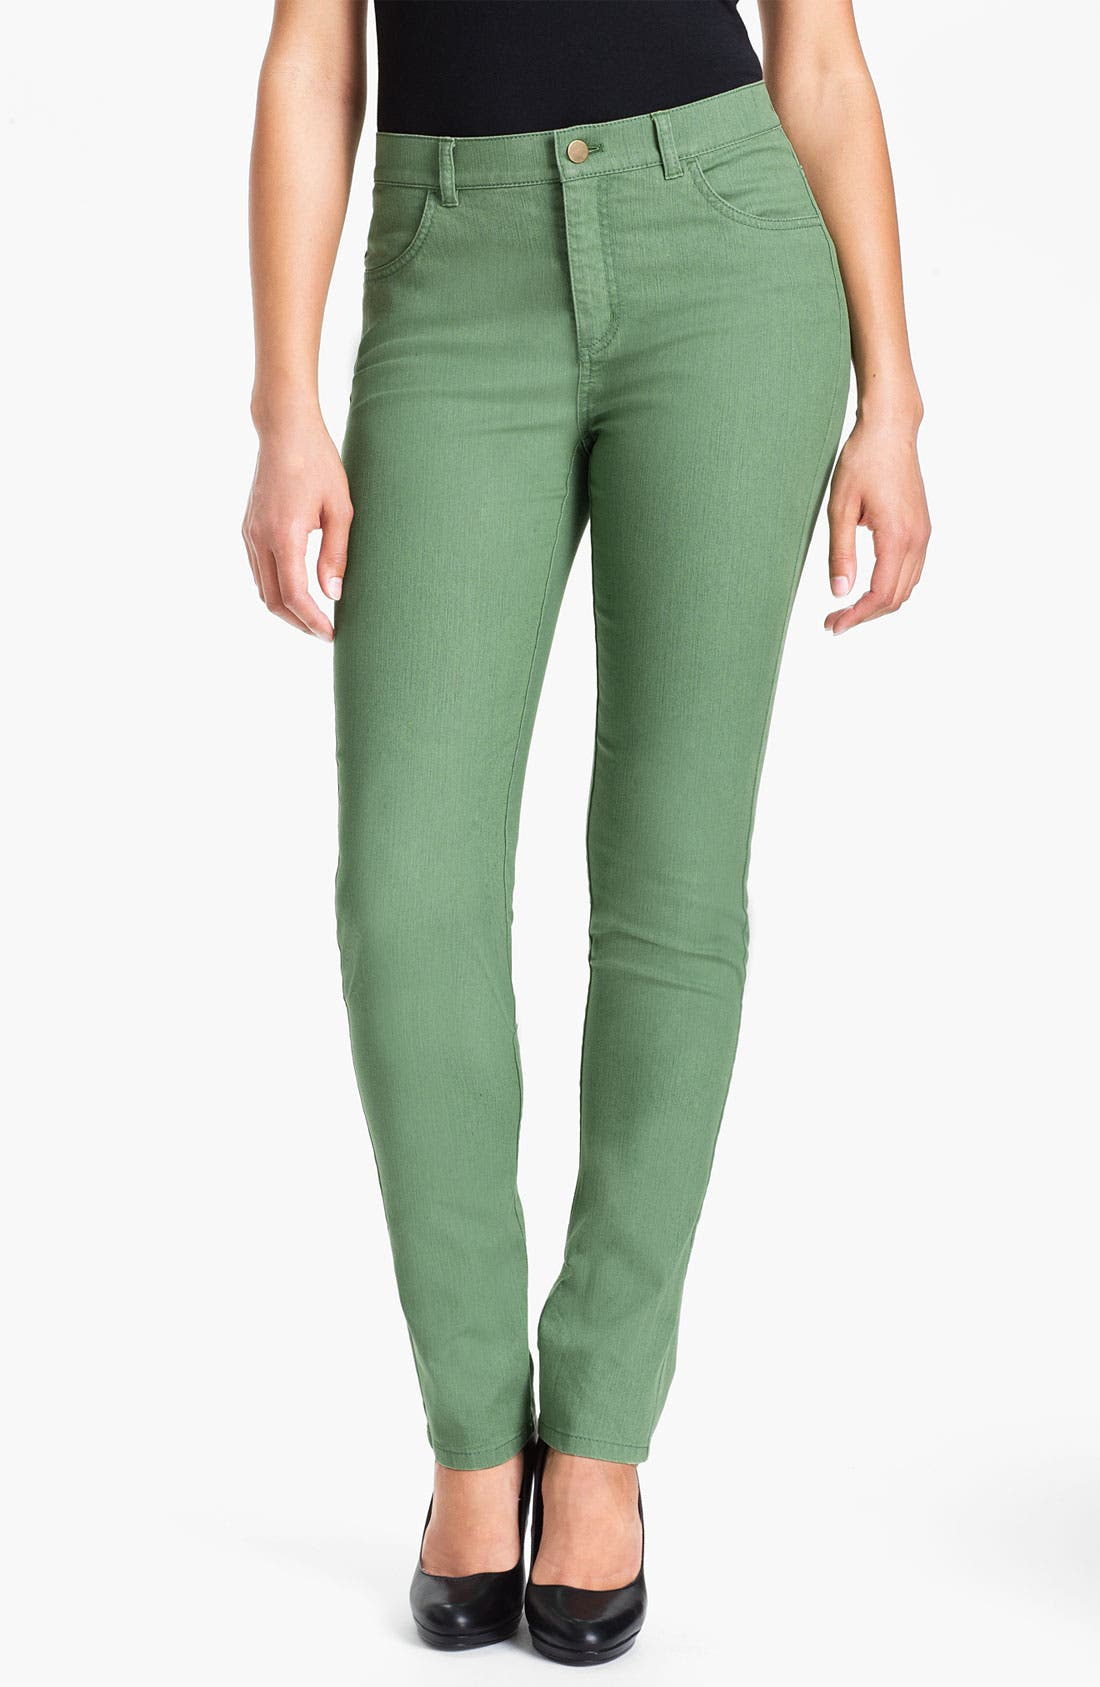 Alternate Image 1 Selected - Lafayette 148 New York Curvy Fit Slim Leg Jeans